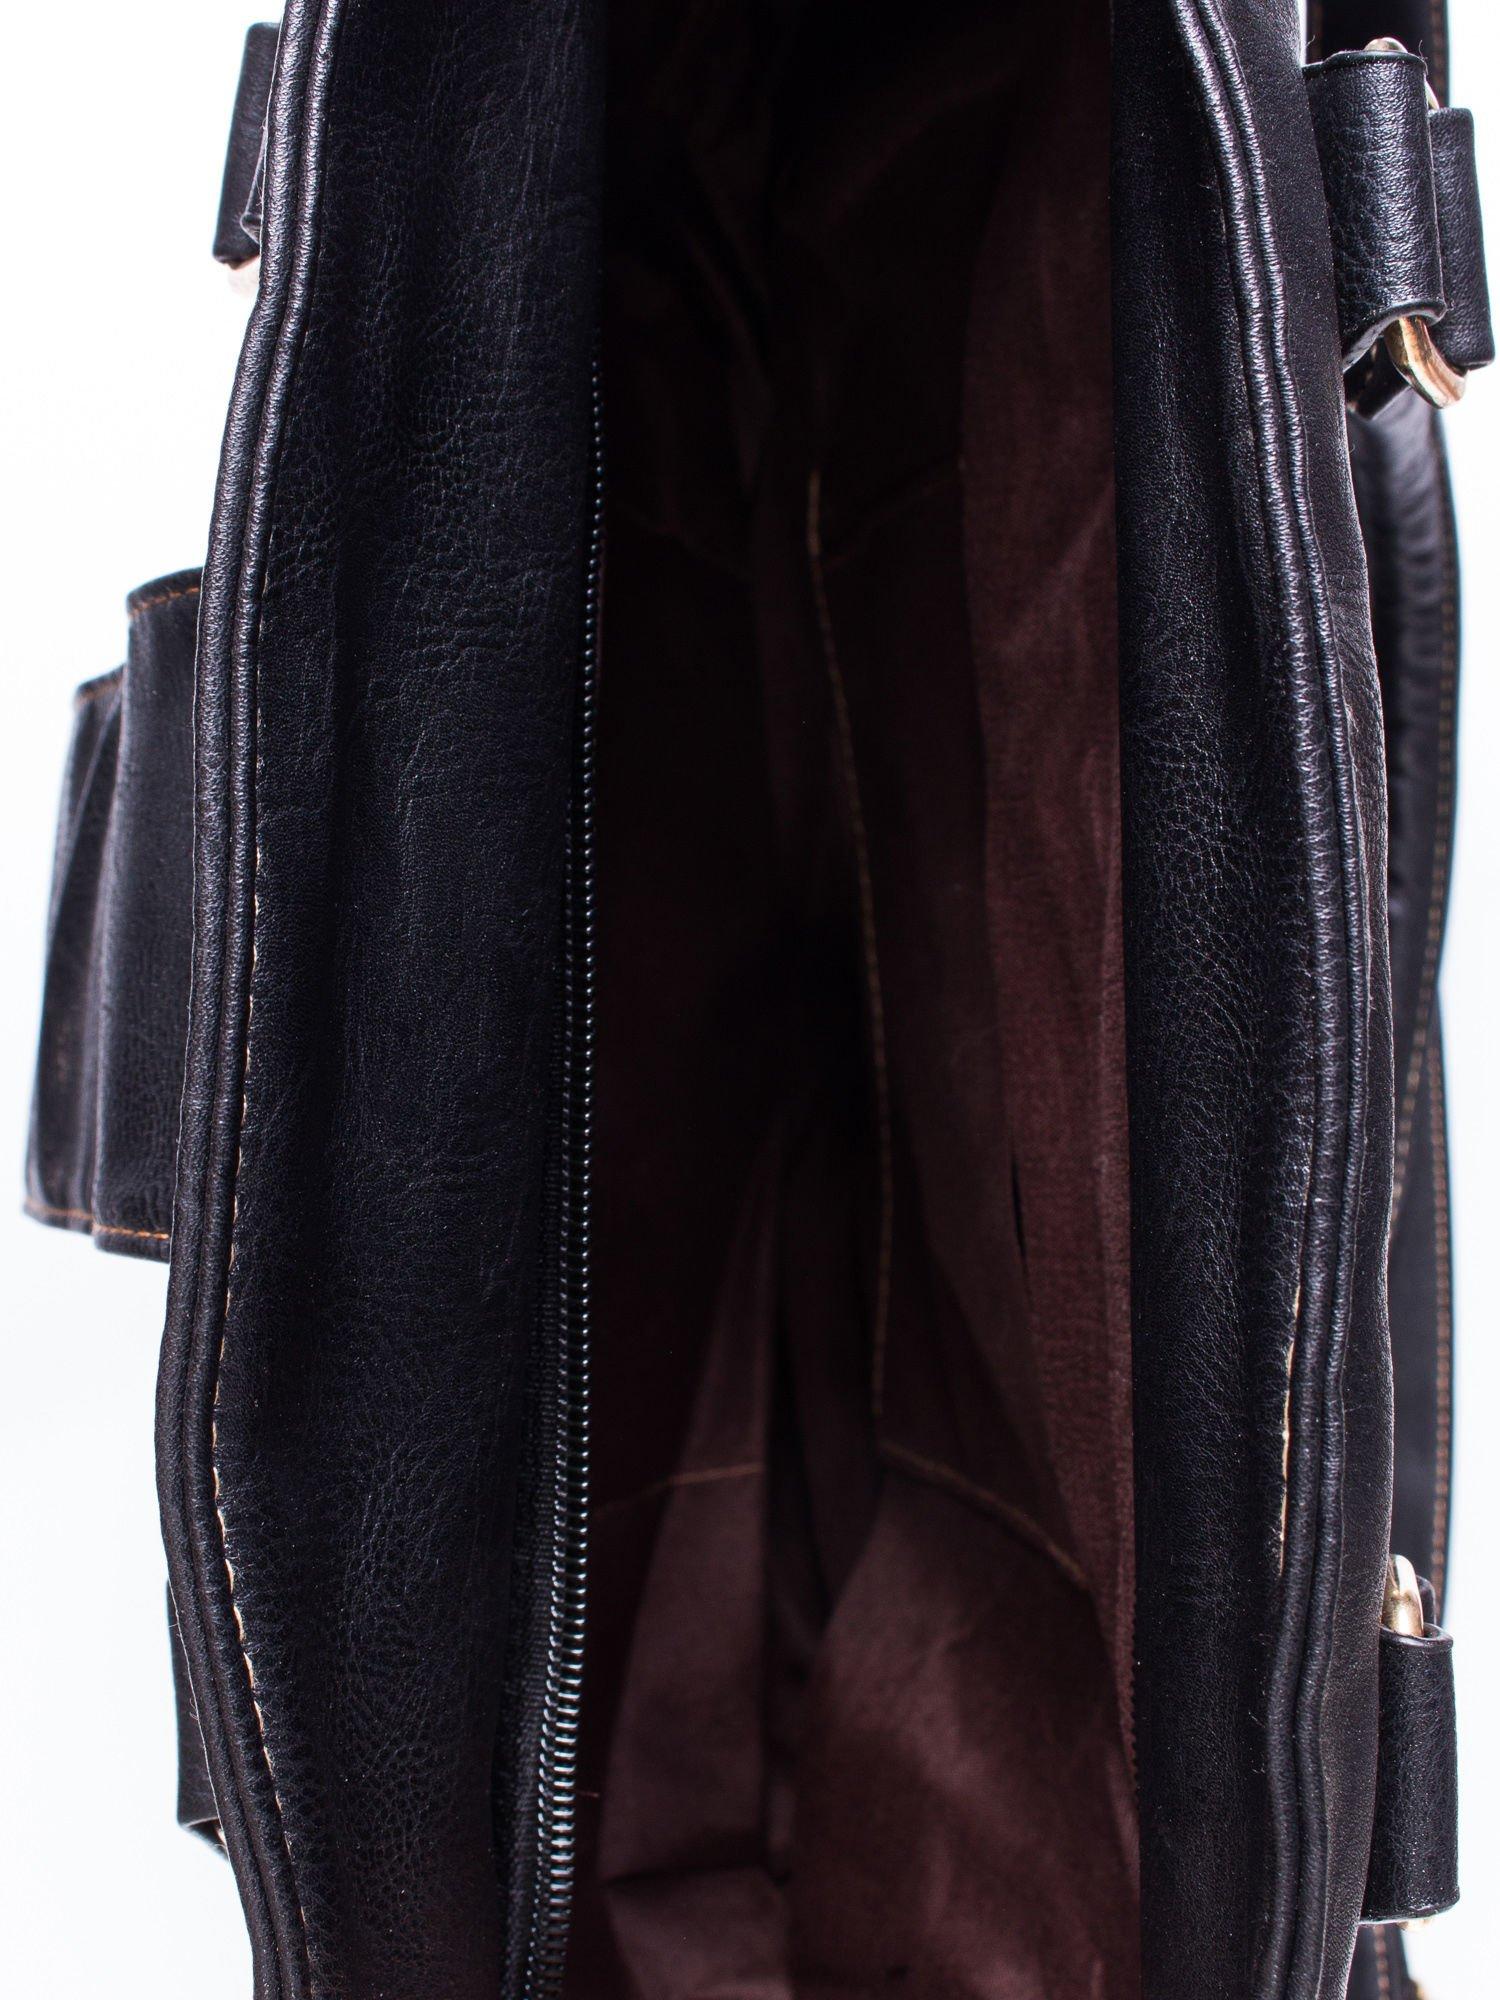 Czarna torba miejska z klapką                                  zdj.                                  4